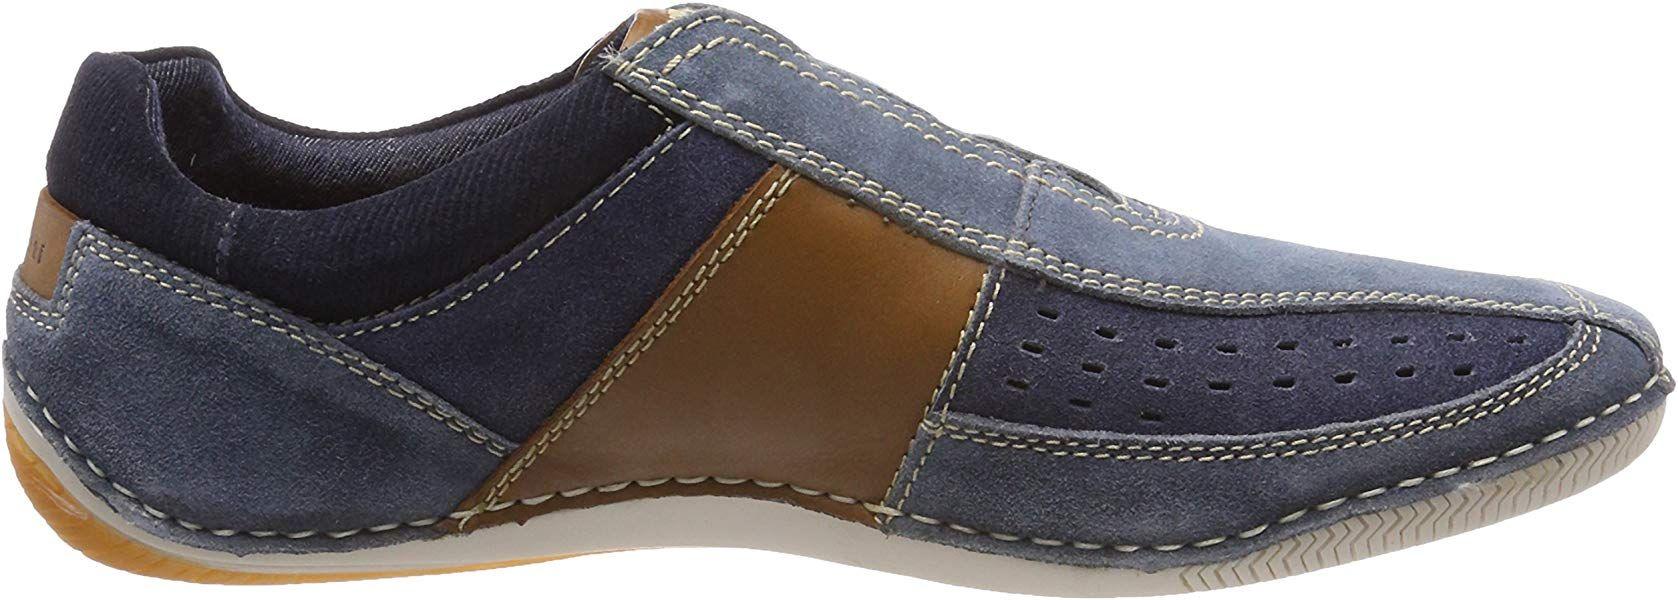 Sioux Herren Callimo Mokassin, ,: Schuhe & Handtaschen